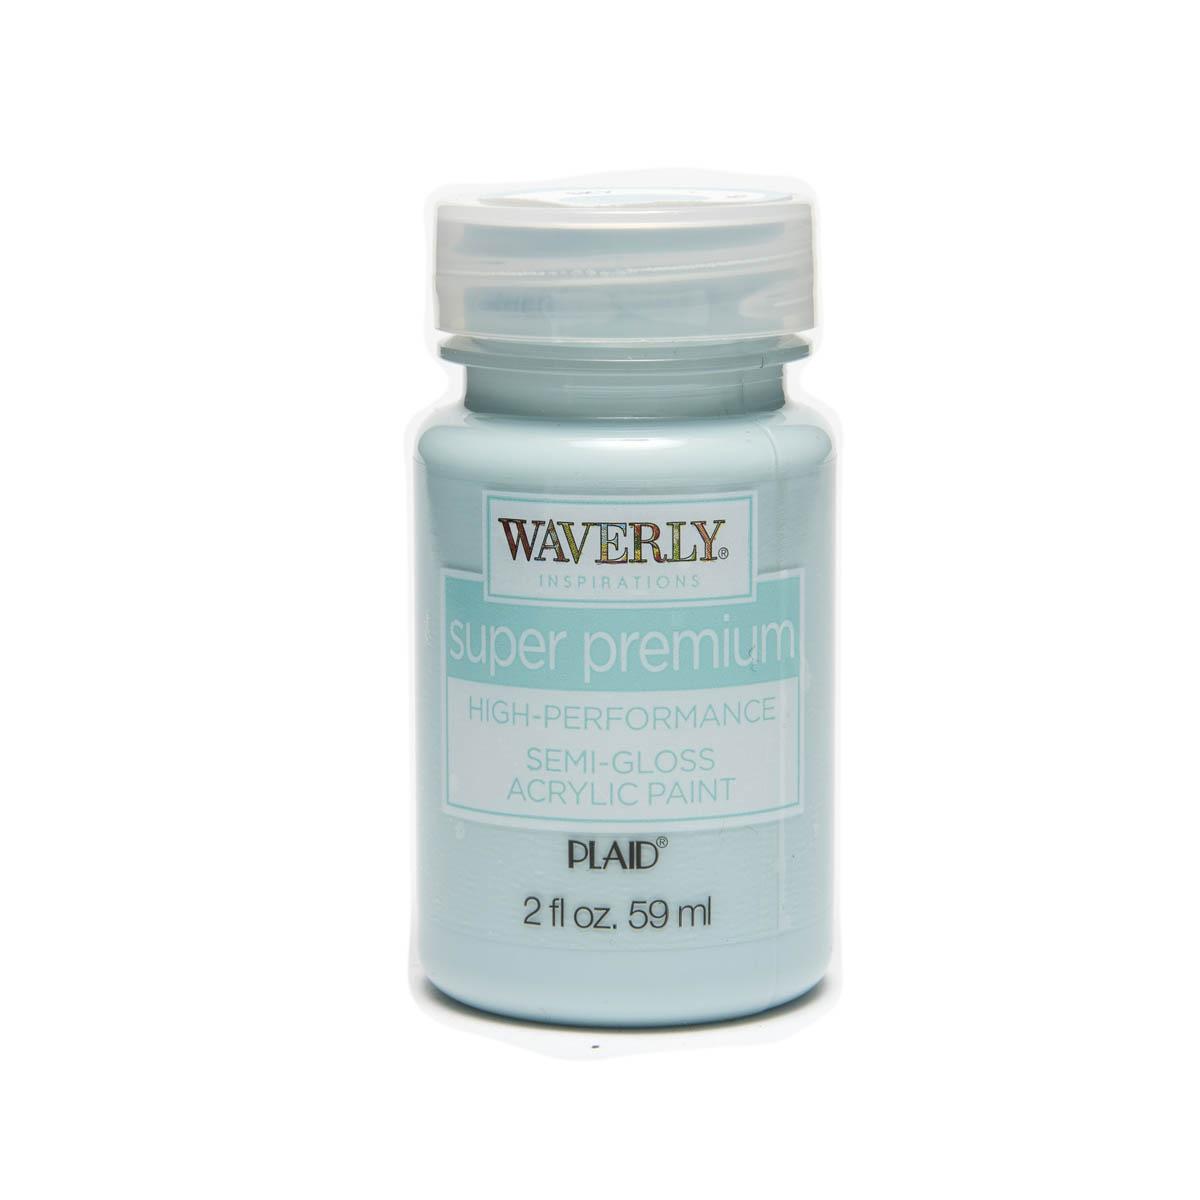 Waverly ® Inspirations Super Premium Semi-Gloss Acrylic Paint - Sky, 2 oz.